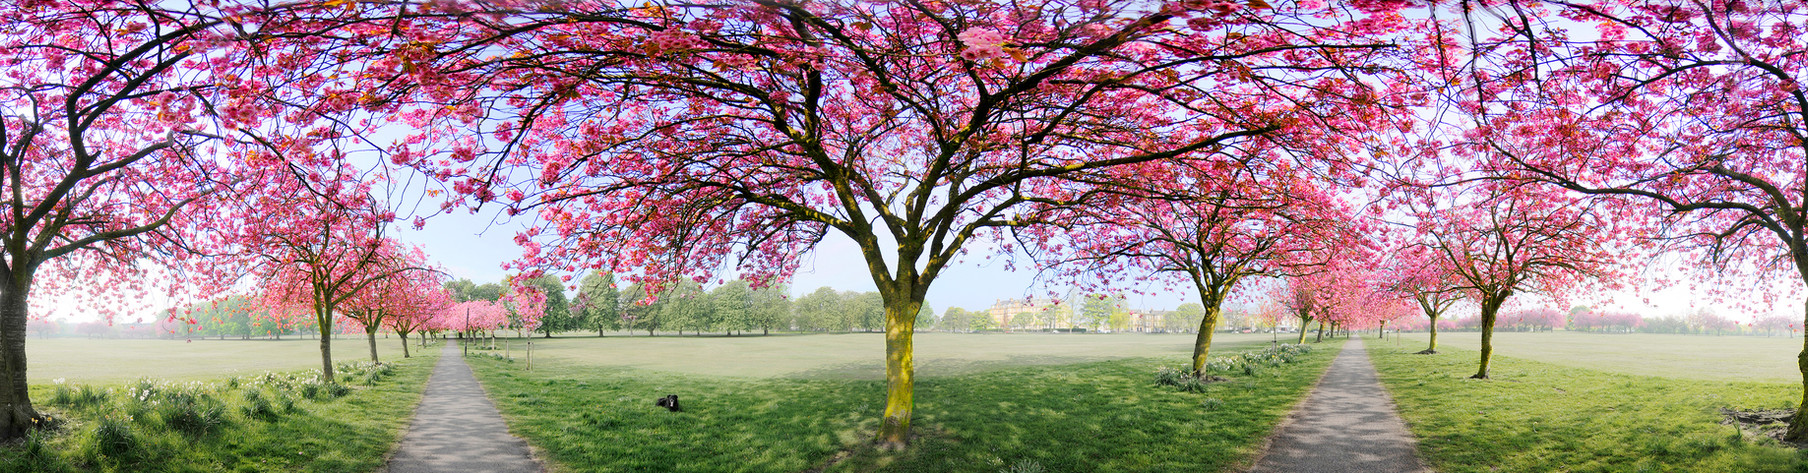 Cherry Tree Walk Harrogate at Spring Time 360 Panorama by Sirastudio. Photographers in Harrogate.